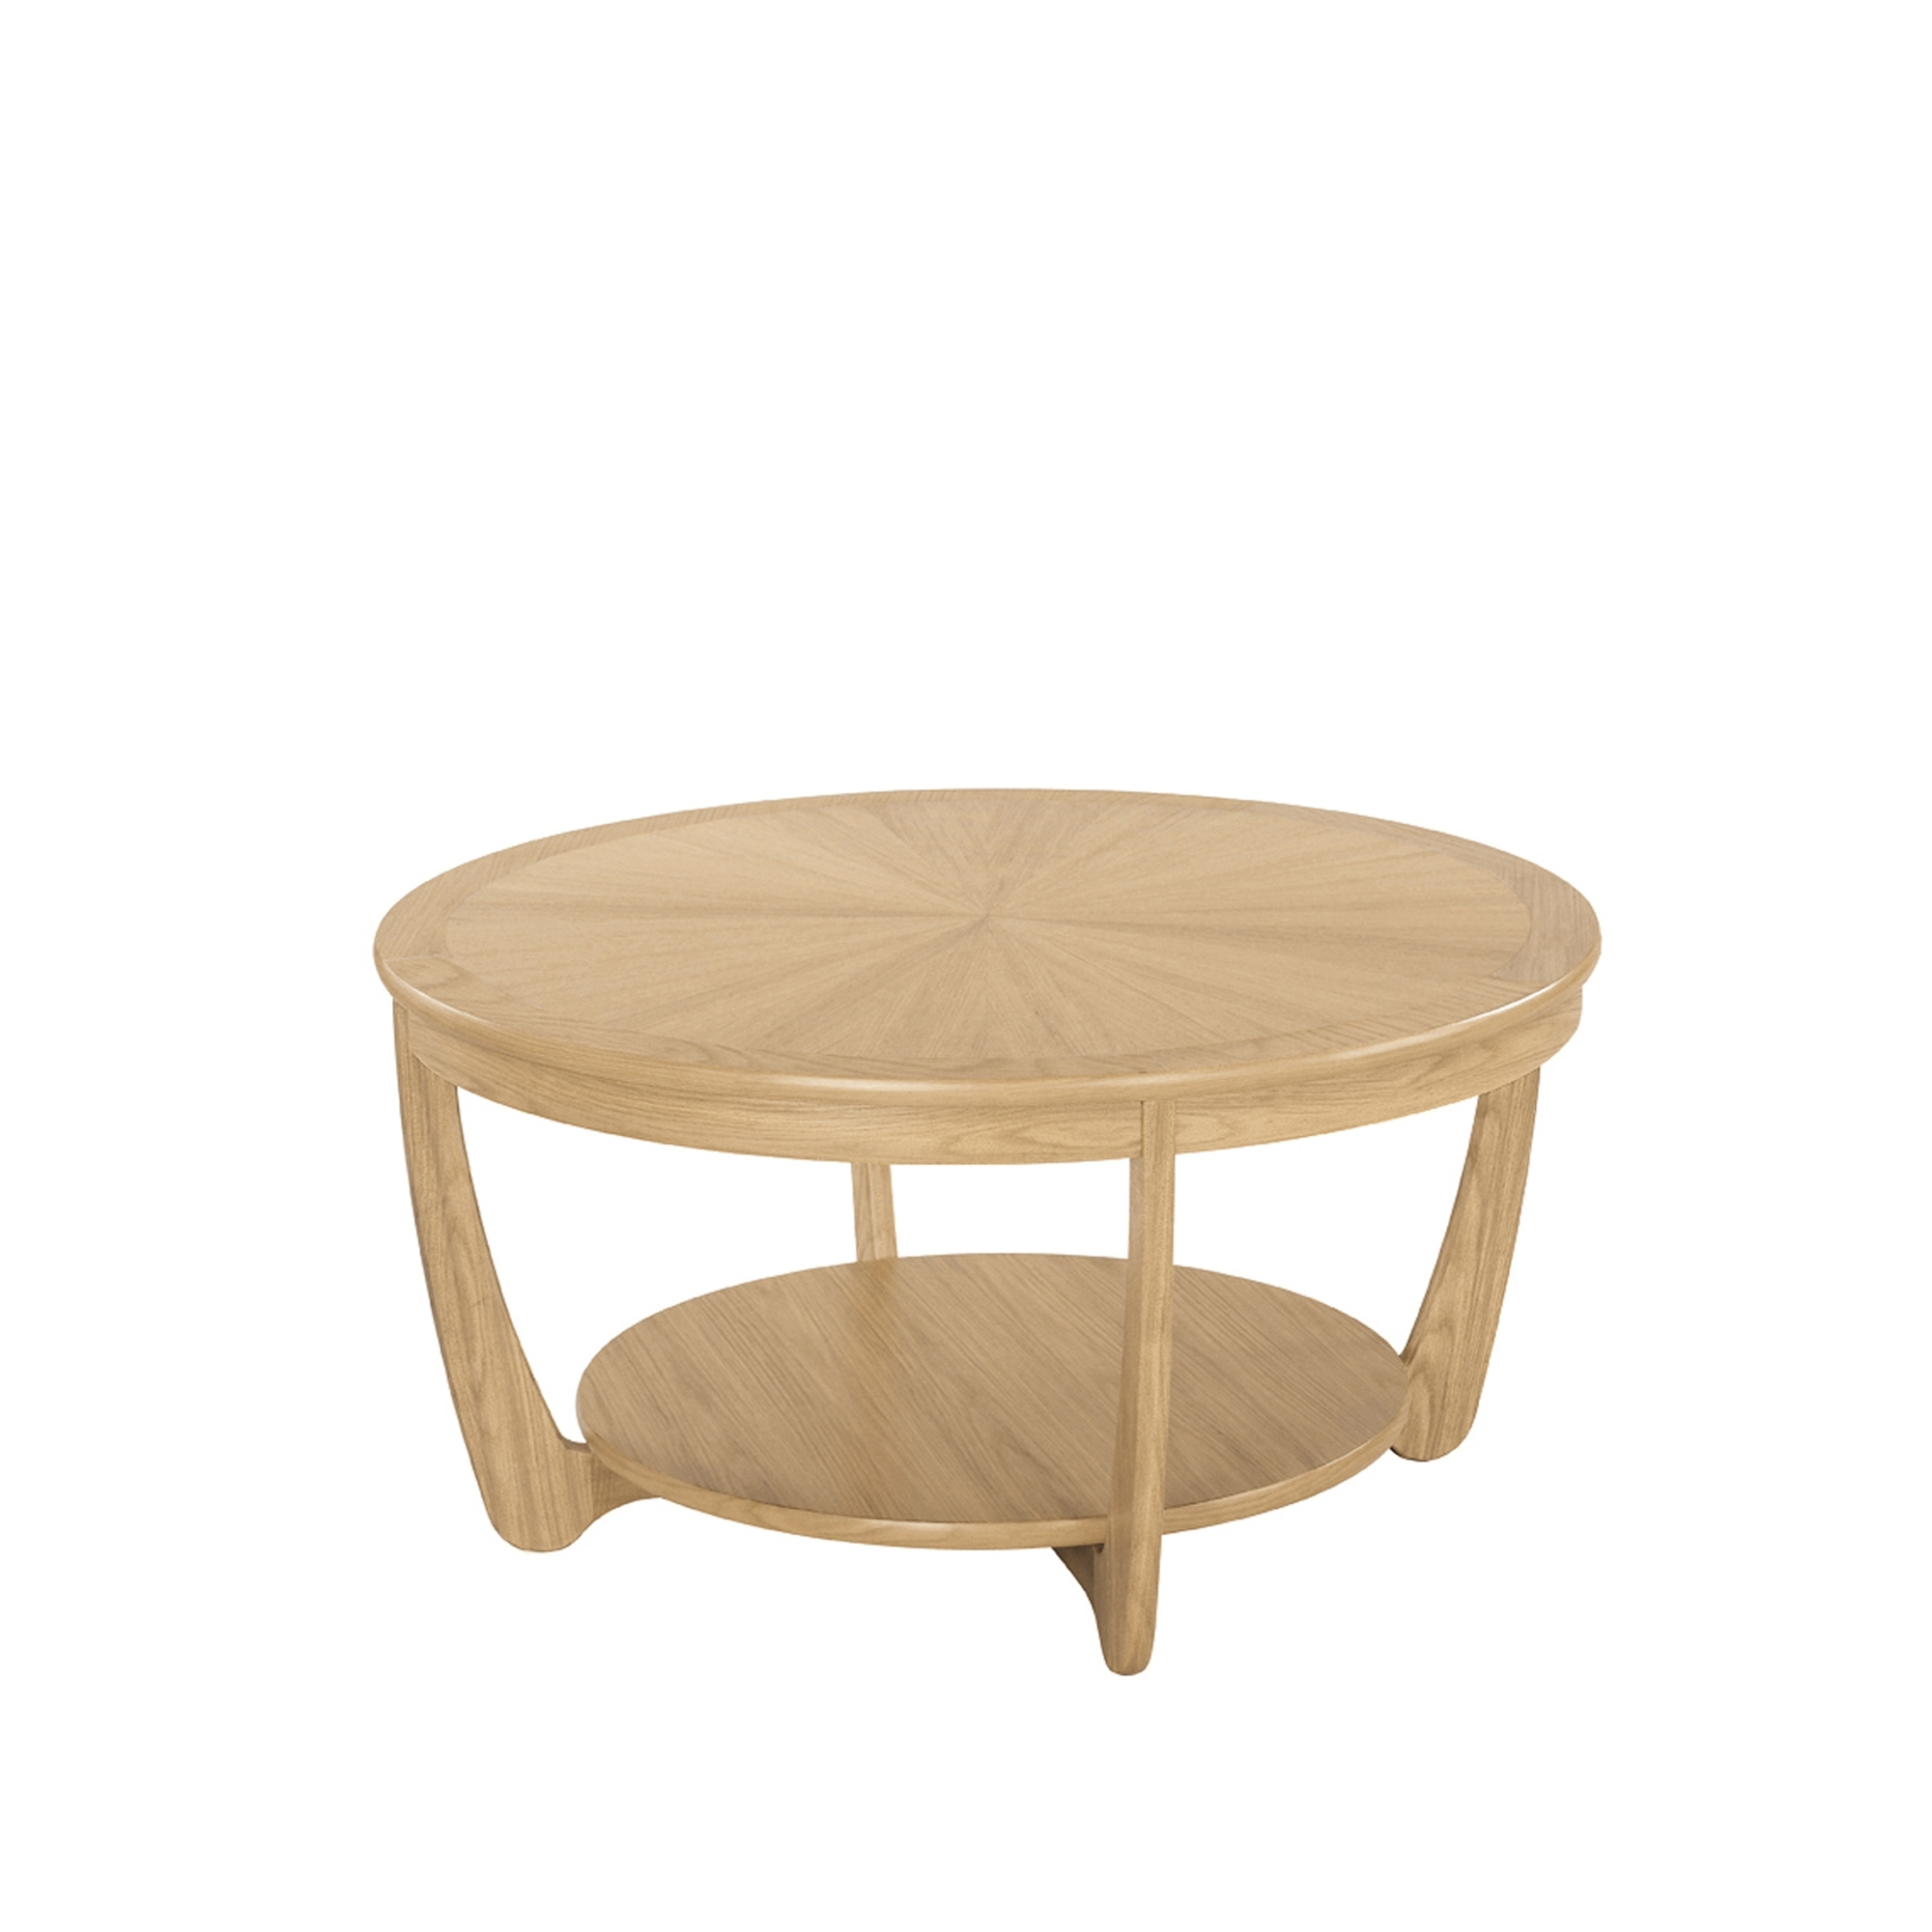 - SHADES OAK Nathan Shades Oak Sunburst Round Coffee Table - Coffee Tables